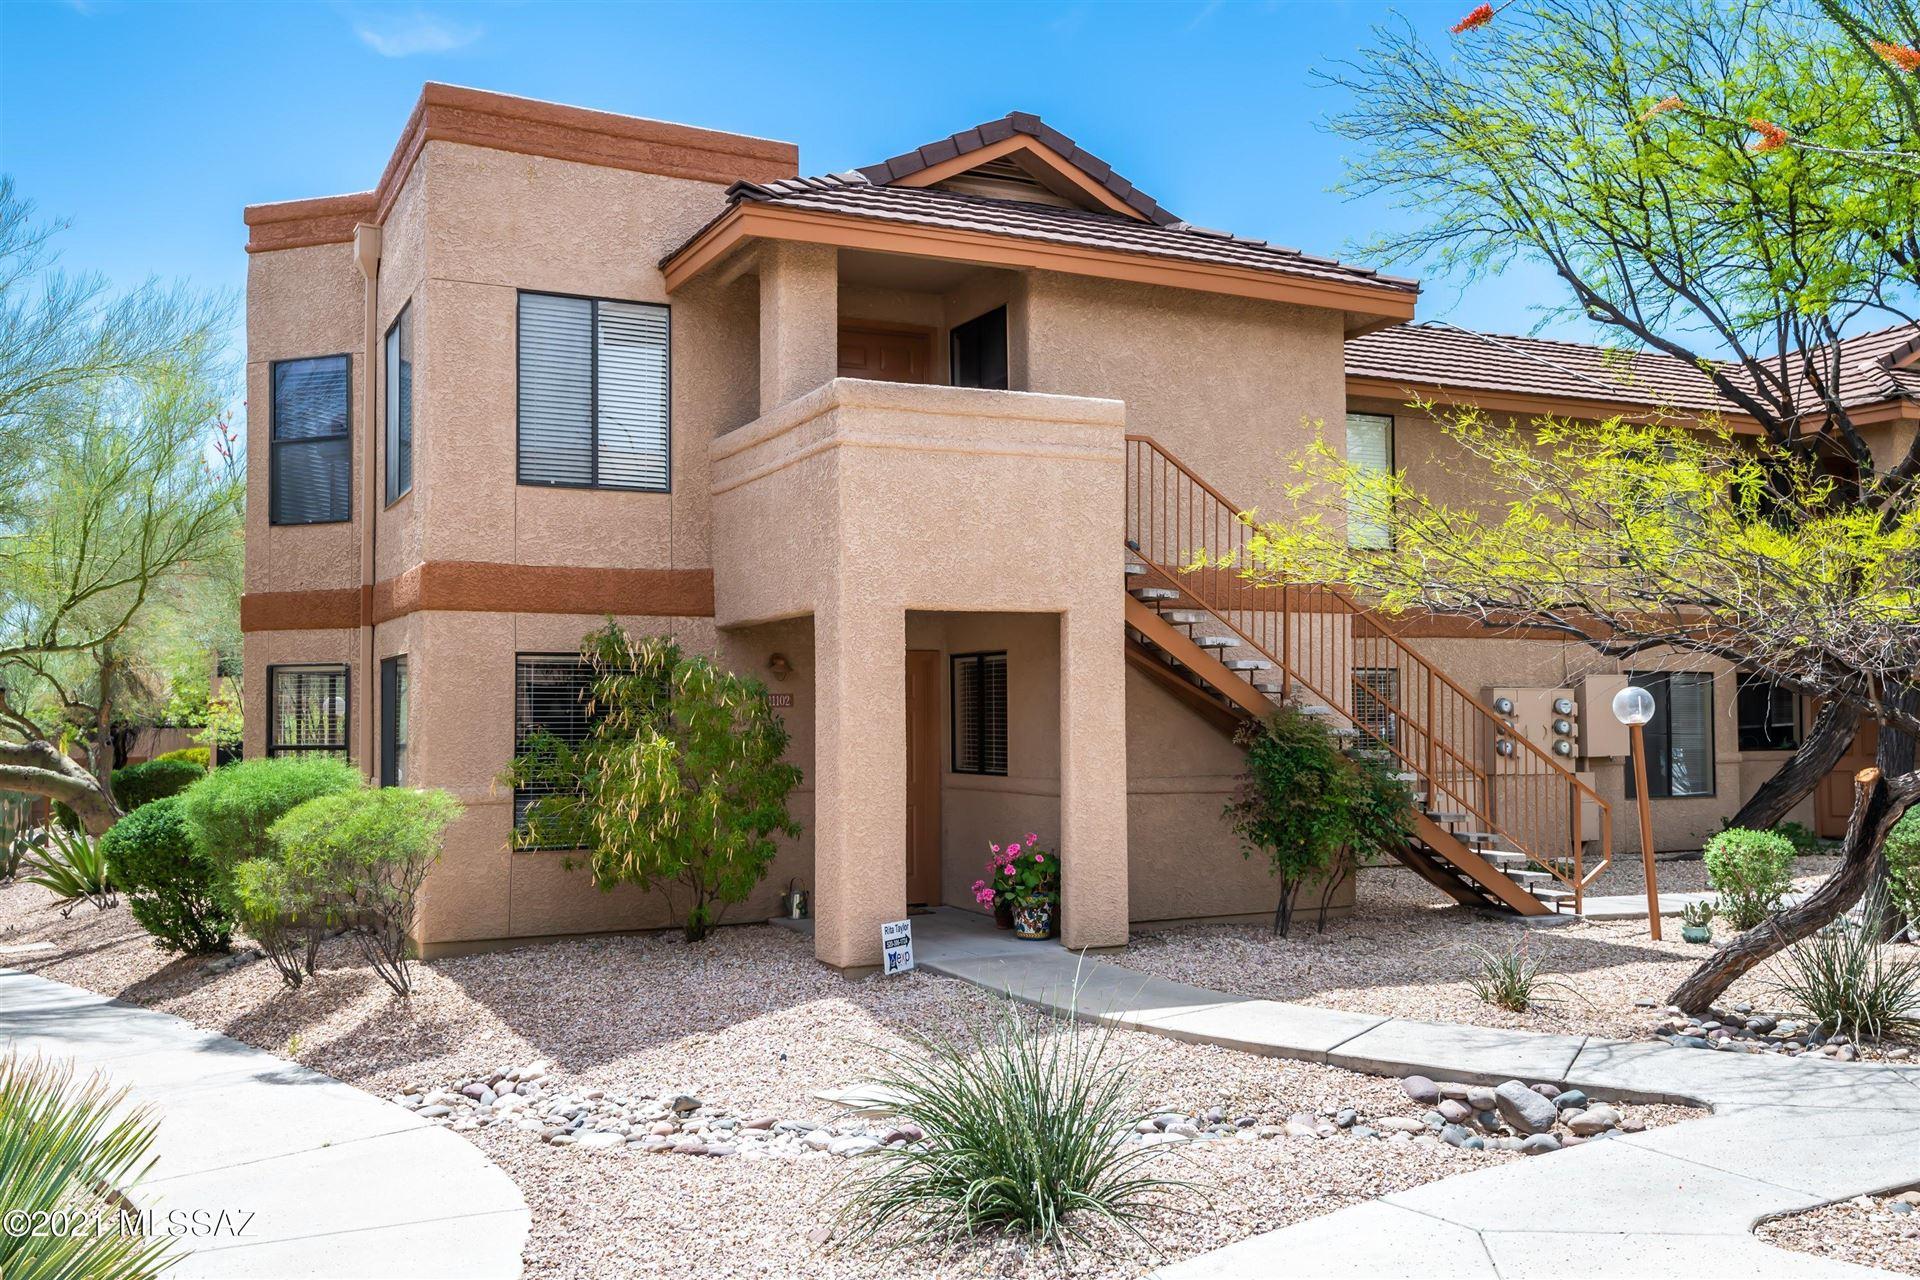 7255 E Snyder Road #11202, Tucson, AZ 85750 - MLS#: 22109681